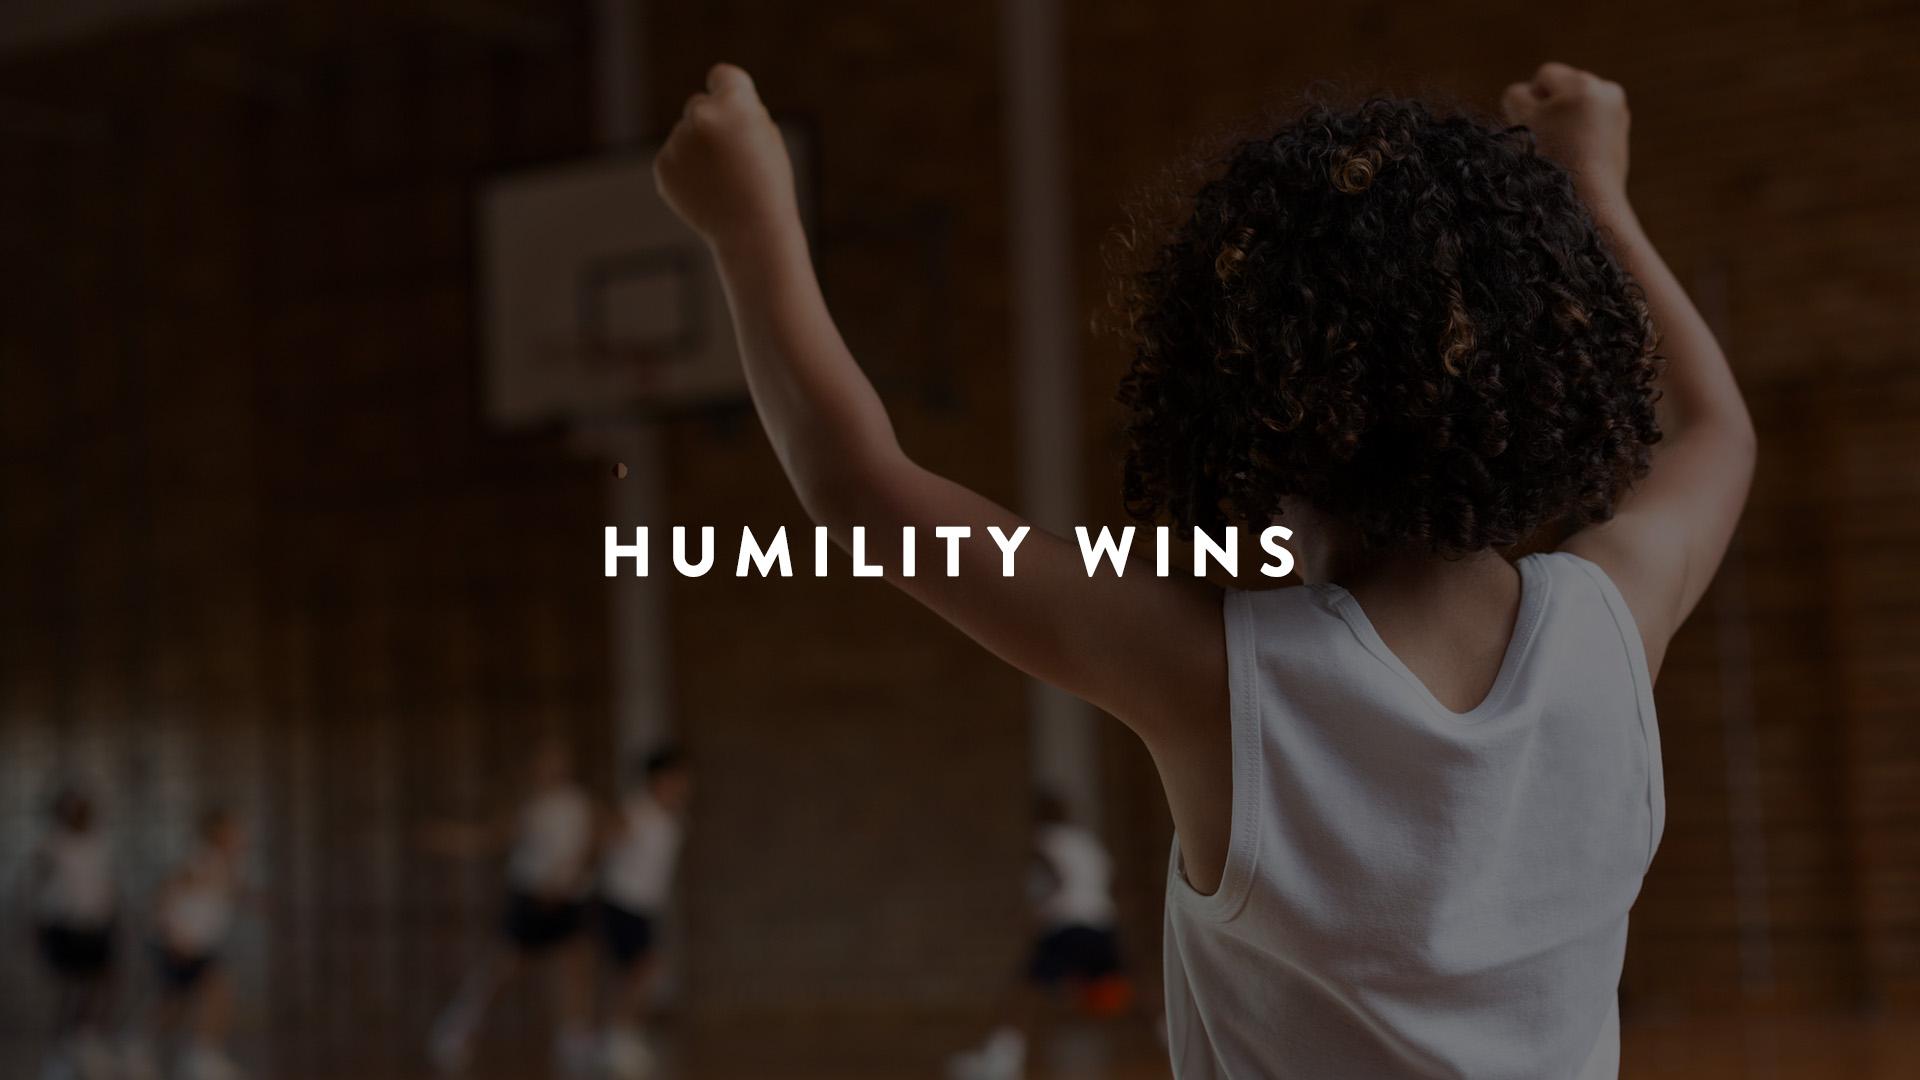 Humility wins